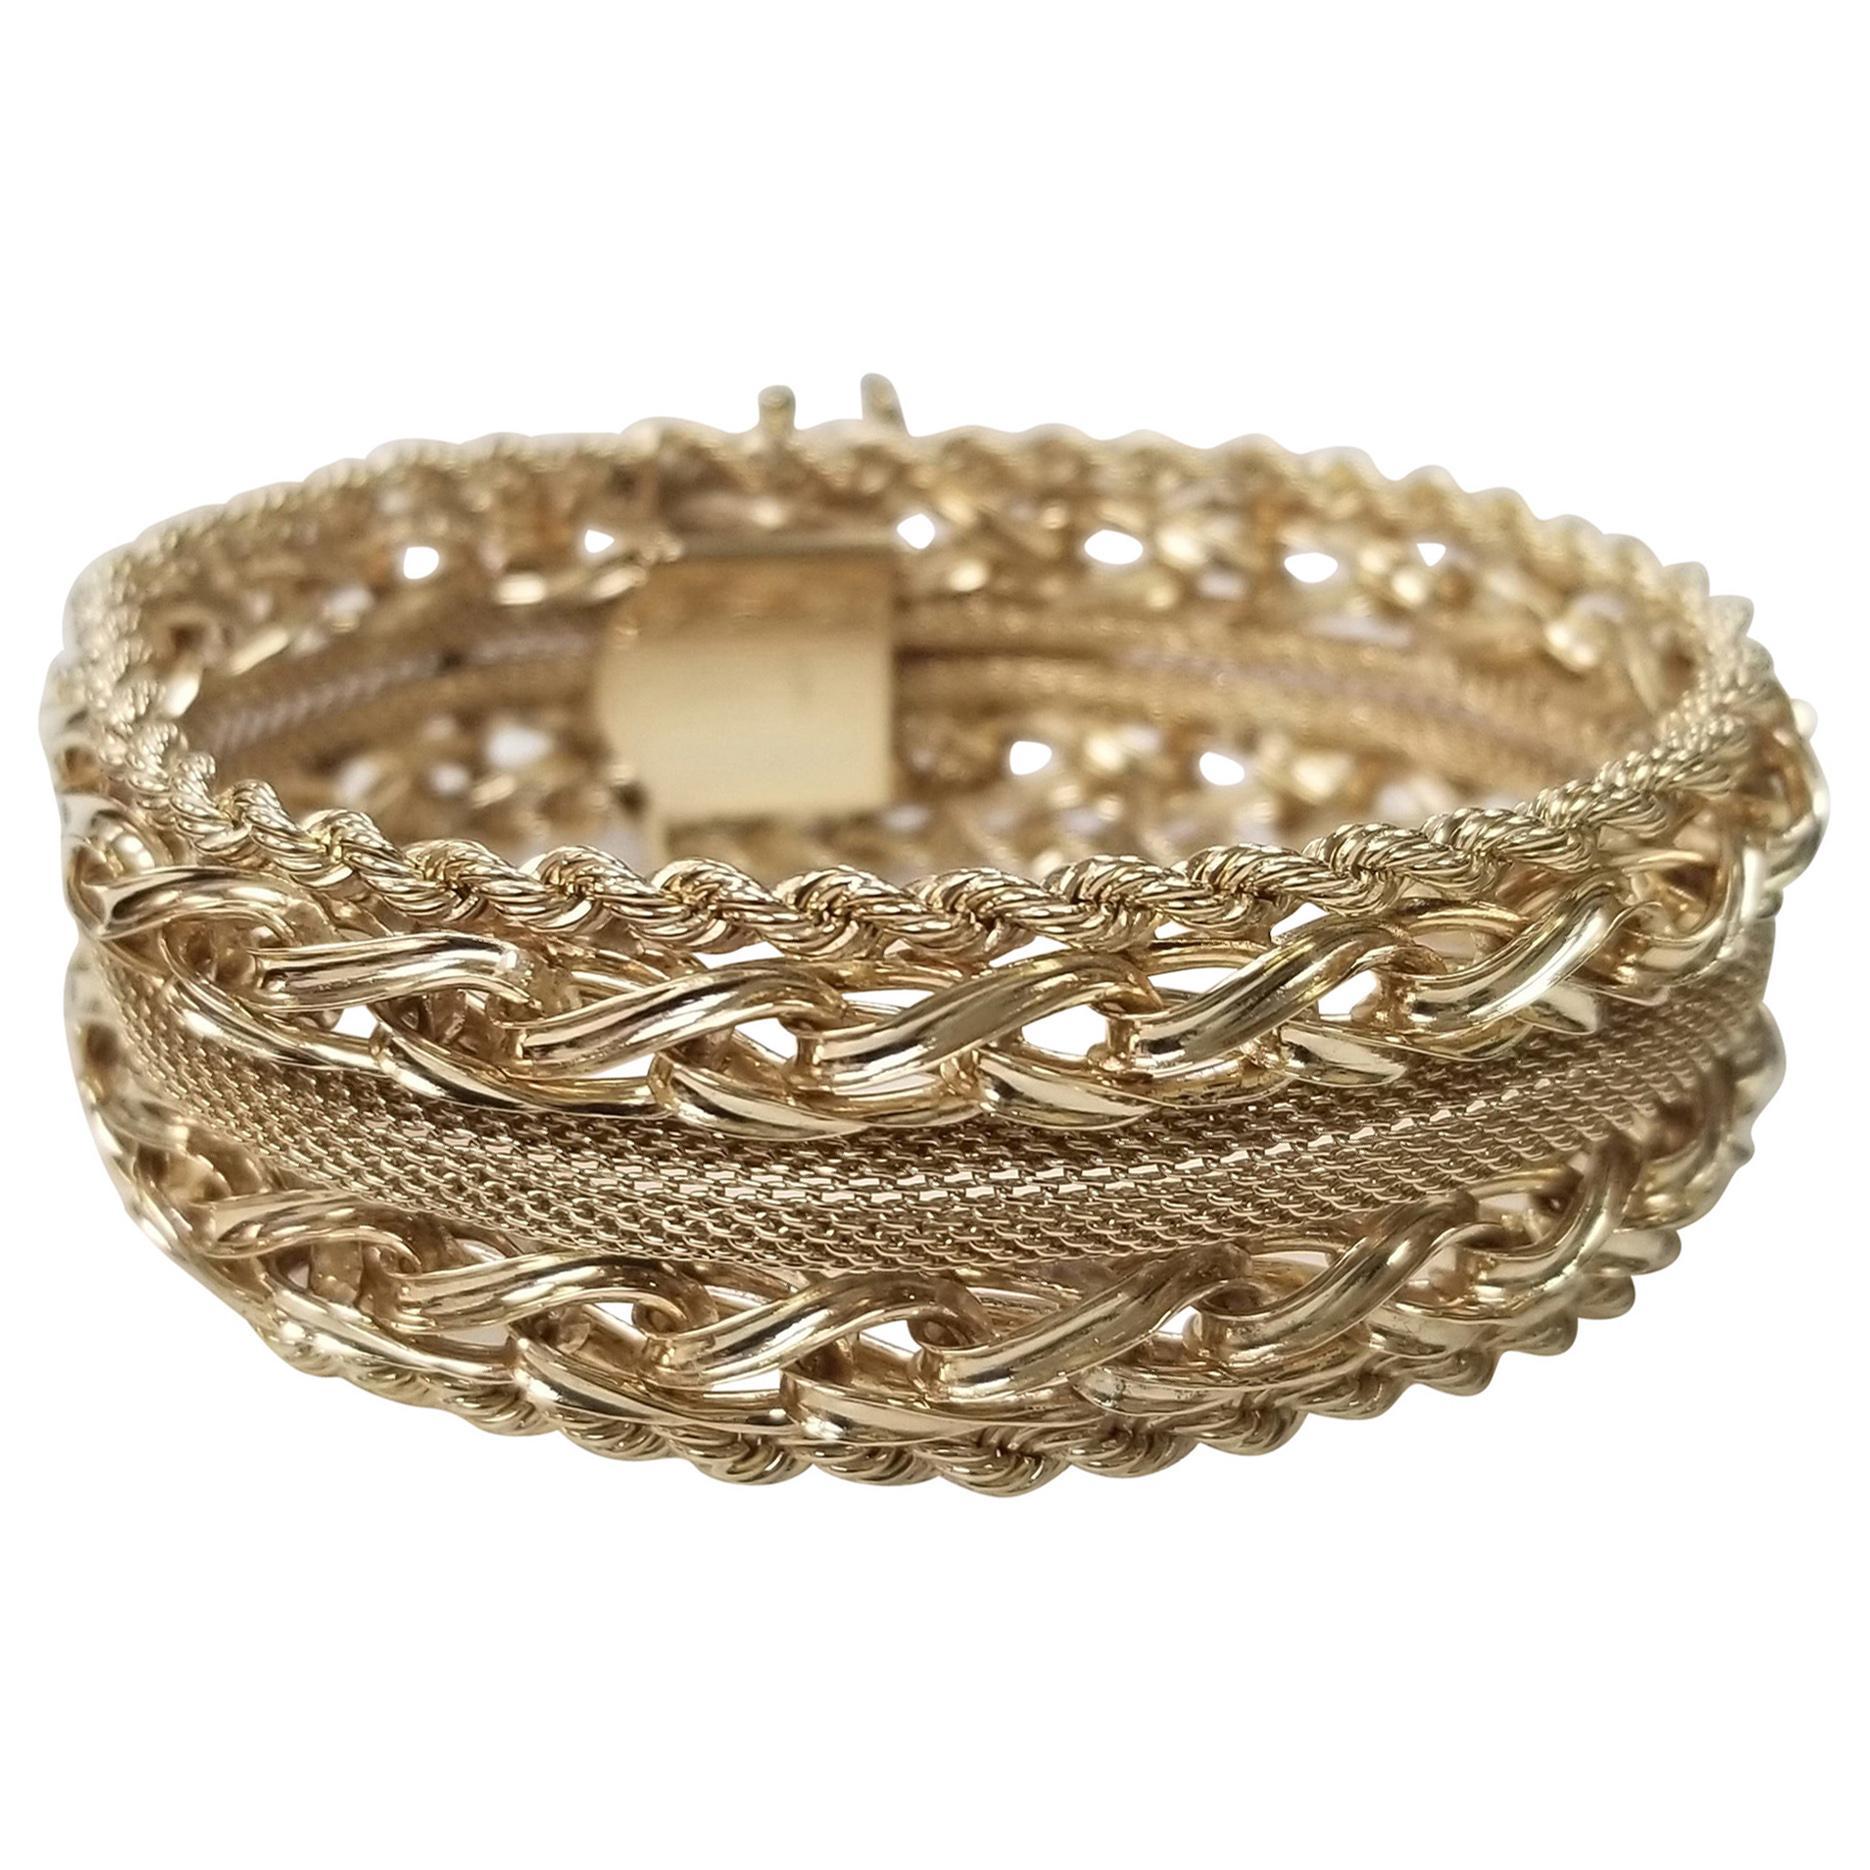 14 Karat Yellow Gold Rope, Link and Mesh Wide Bracelet